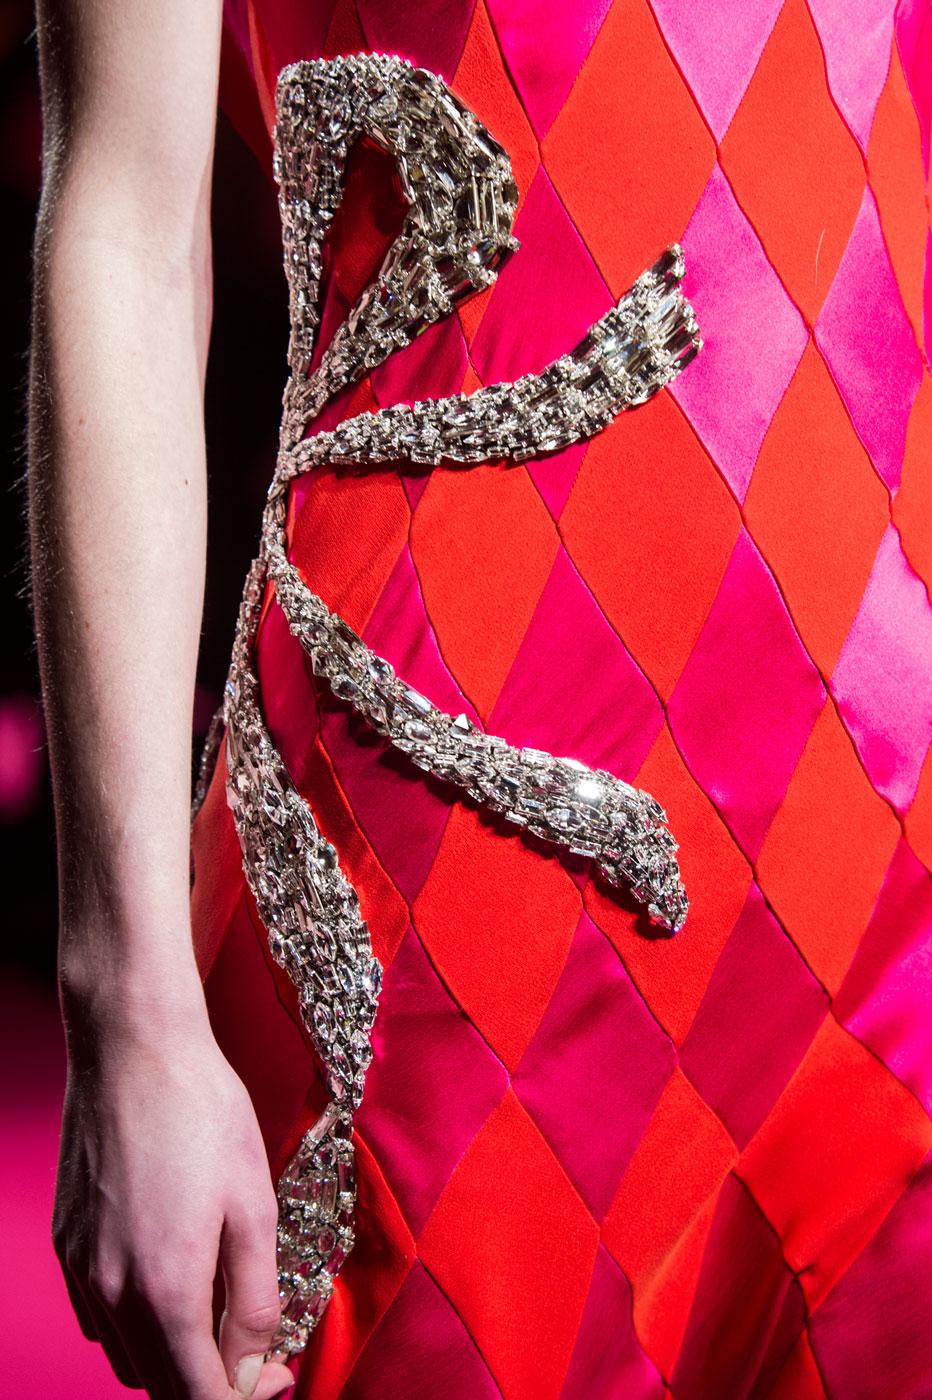 Schiaparelli-fashion-runway-show-close-ups-haute-couture-paris-spring-summer-2015-the-impression-55